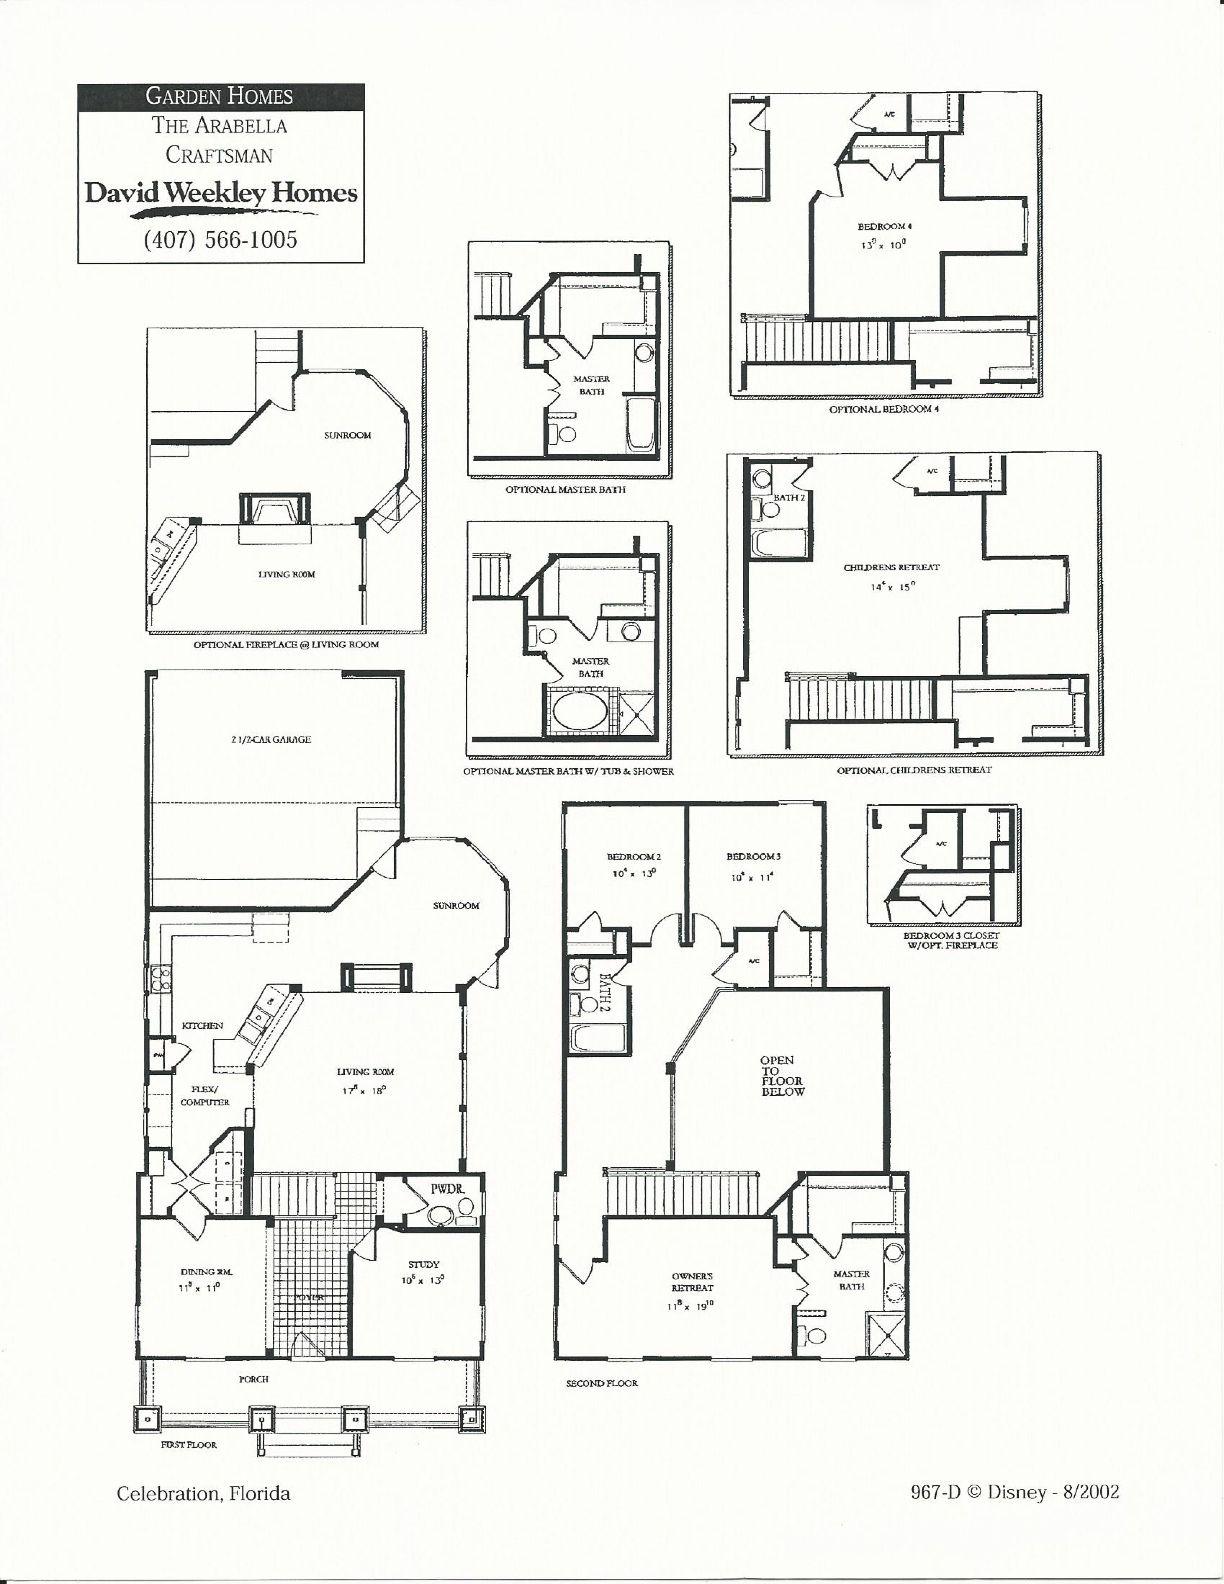 Arabella Craftsman Floor Plans In Celebration Fl Manufactured Homes Floor Plans Craftsman Floor Plans Floor Plans